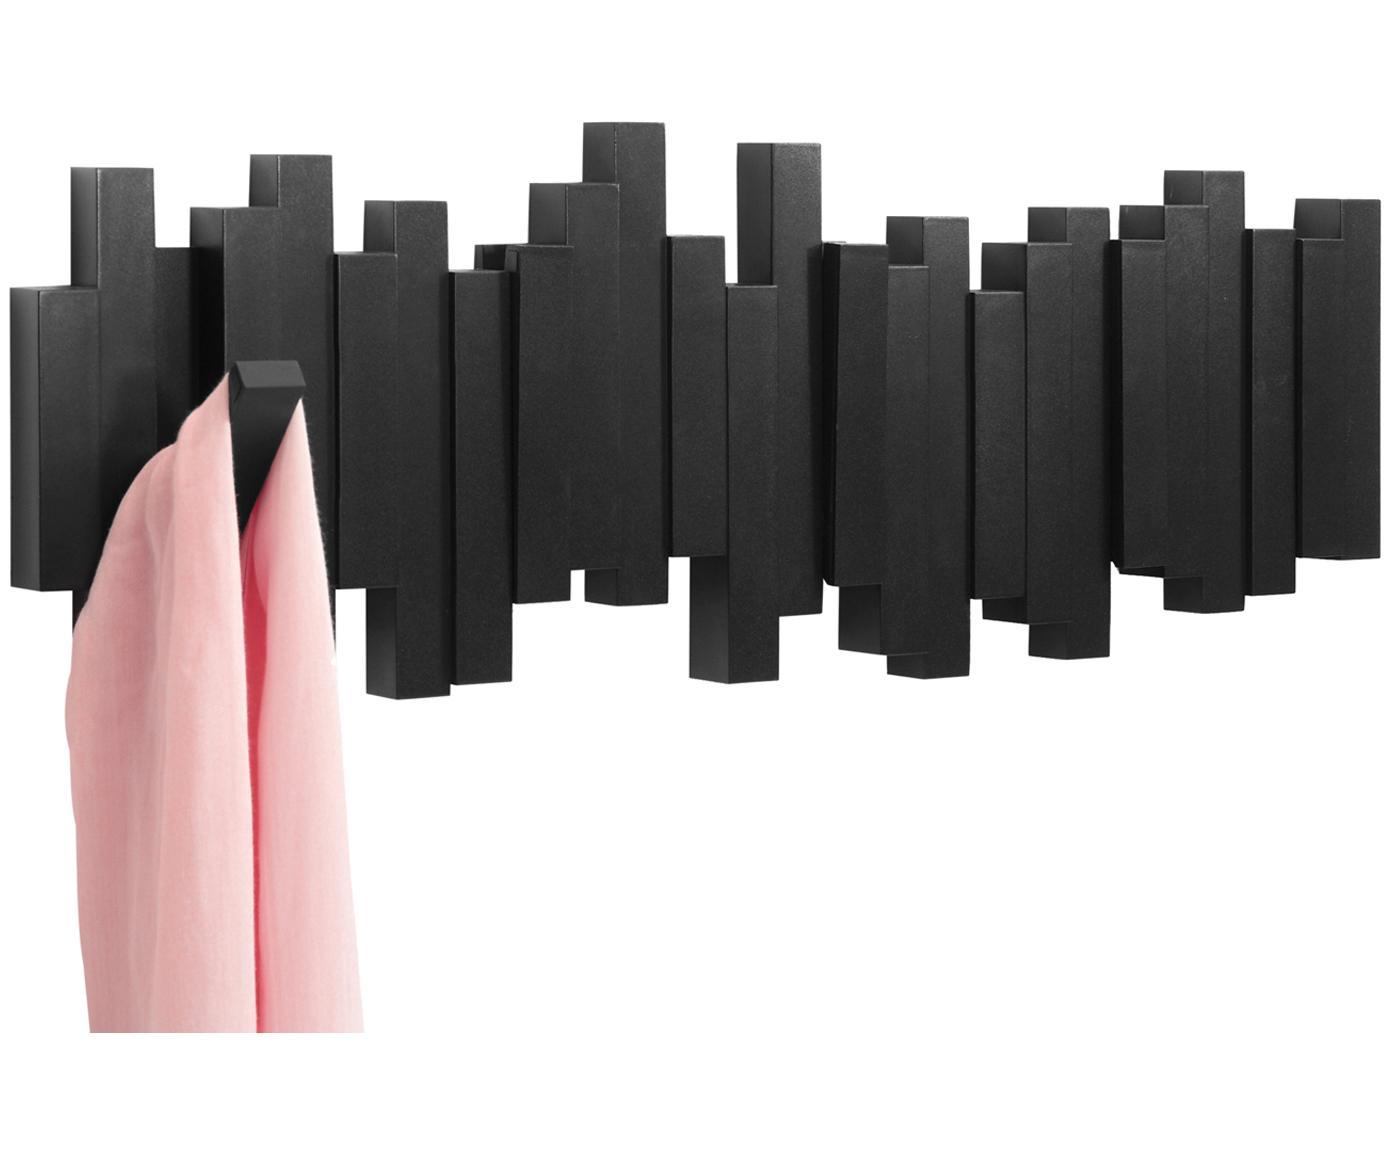 Wandkapstok Sticks, Kunststof, Zwart, 48 x 18 cm